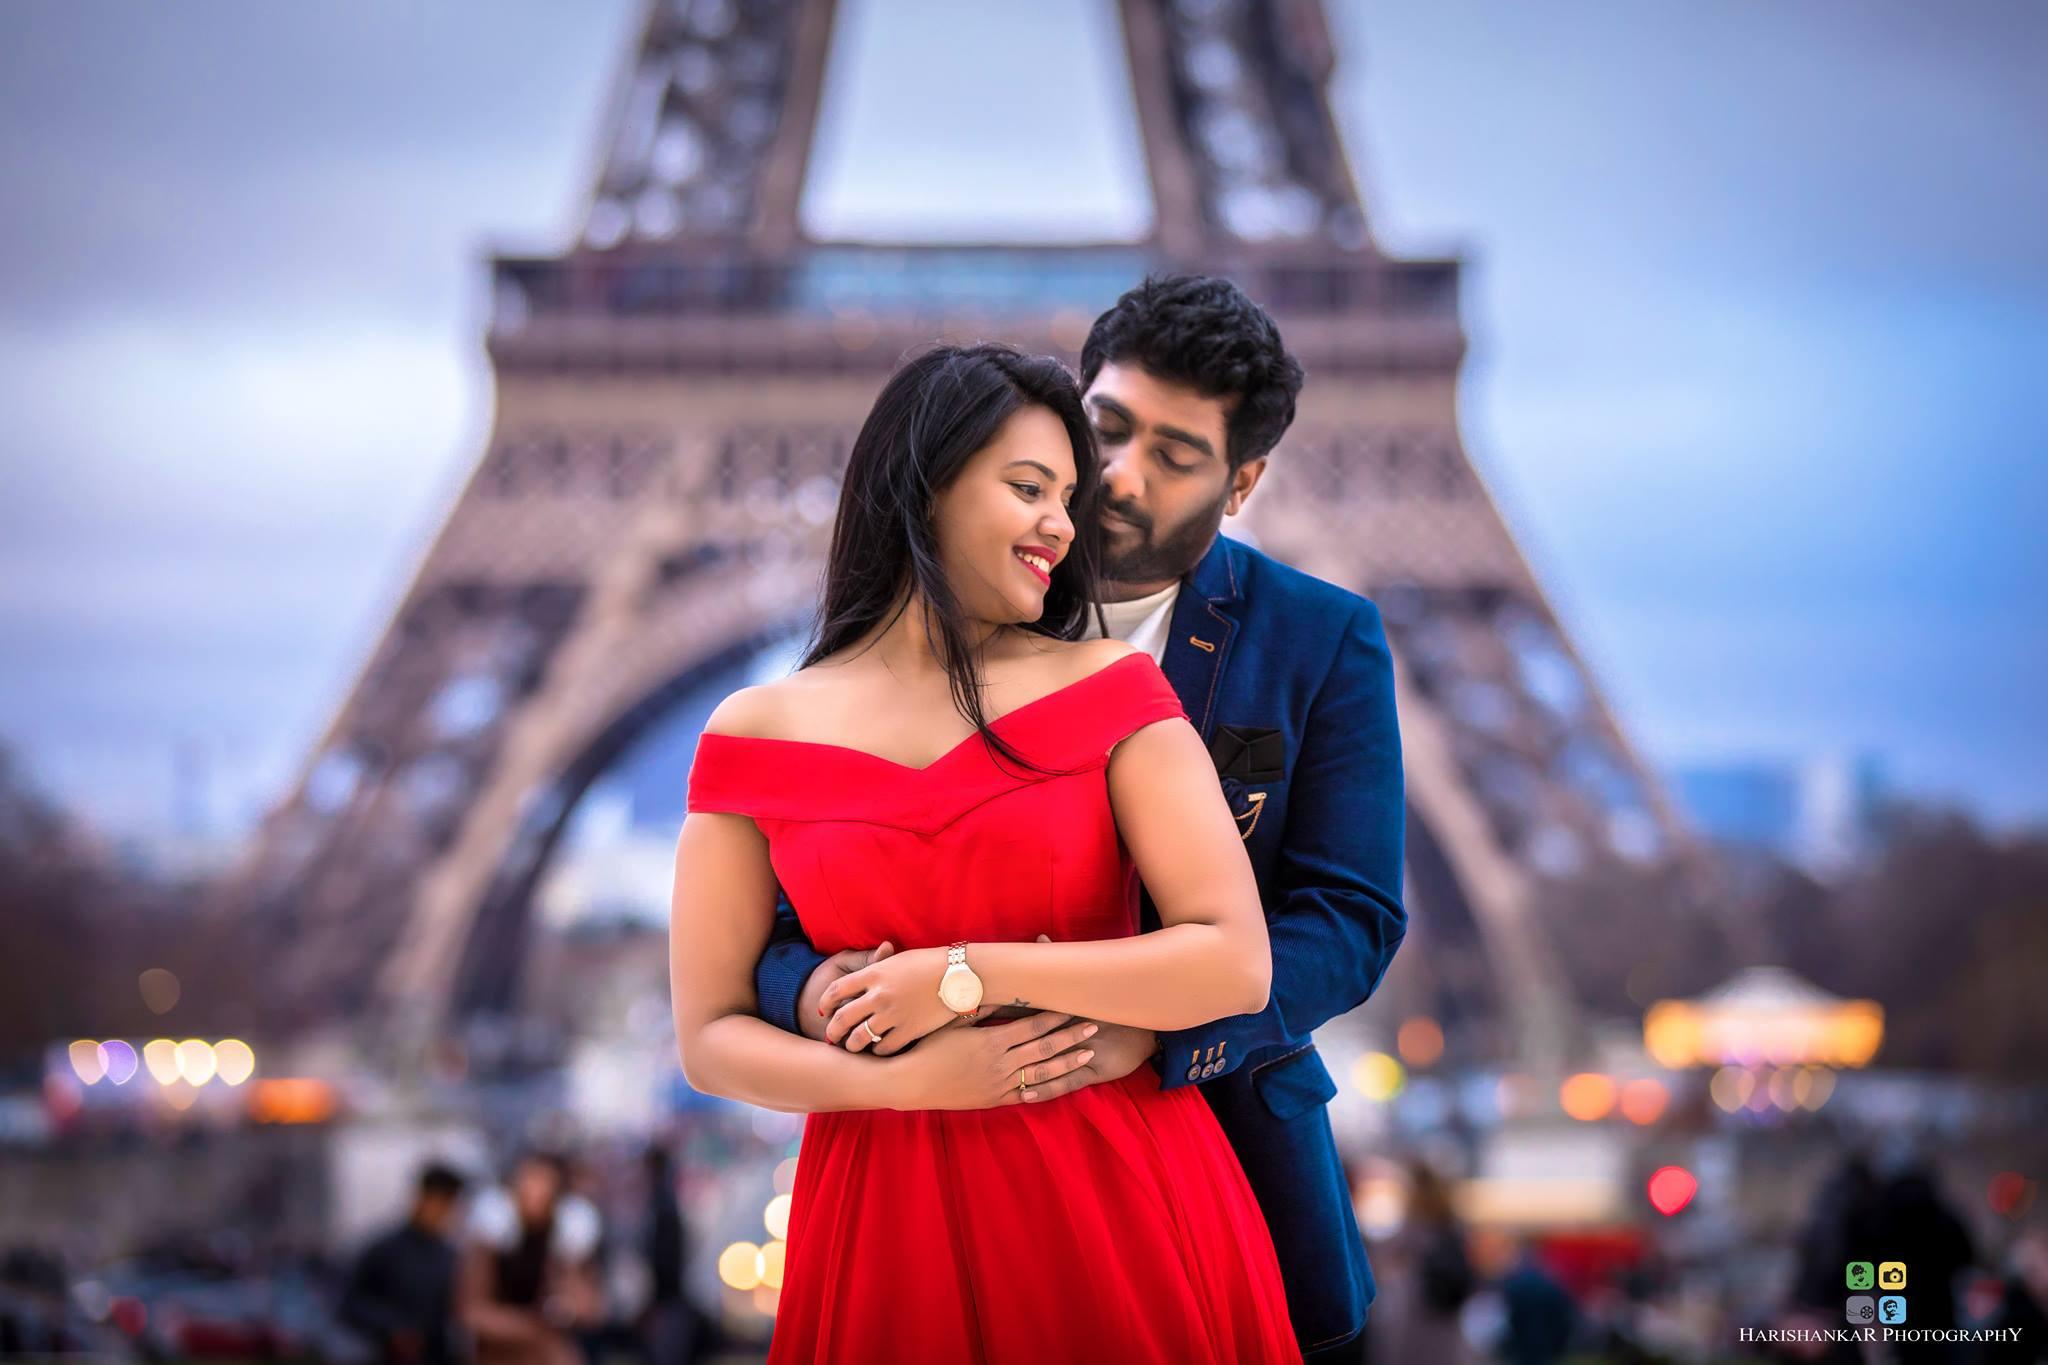 Chilled in Paris